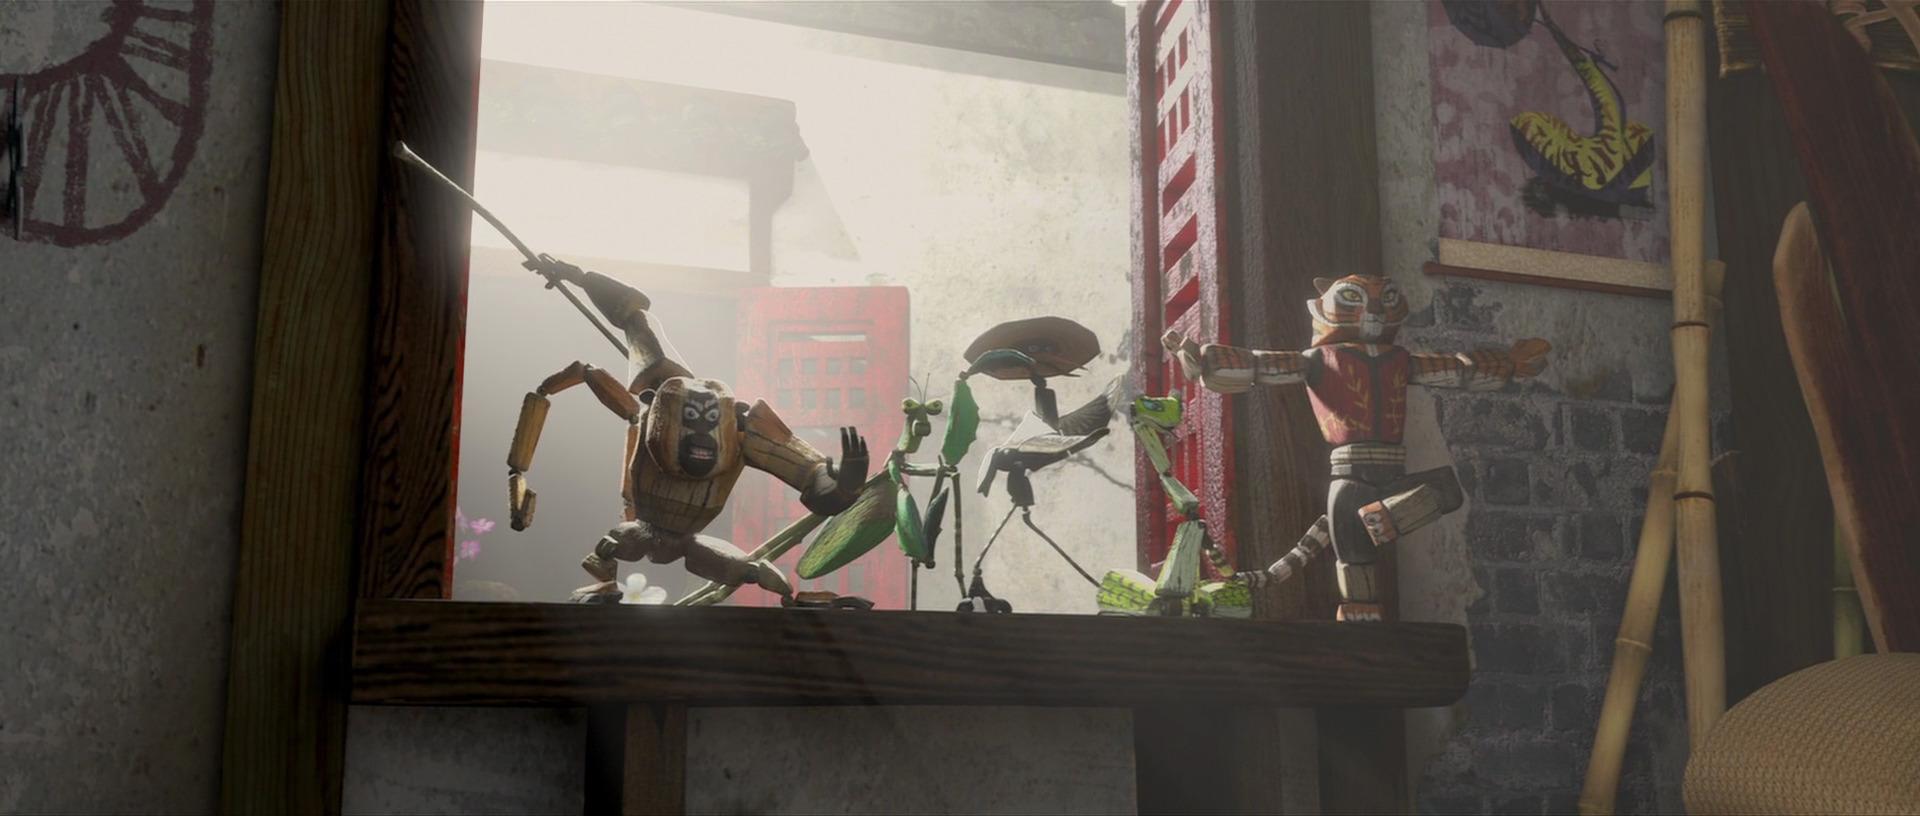 Furious Five action figures